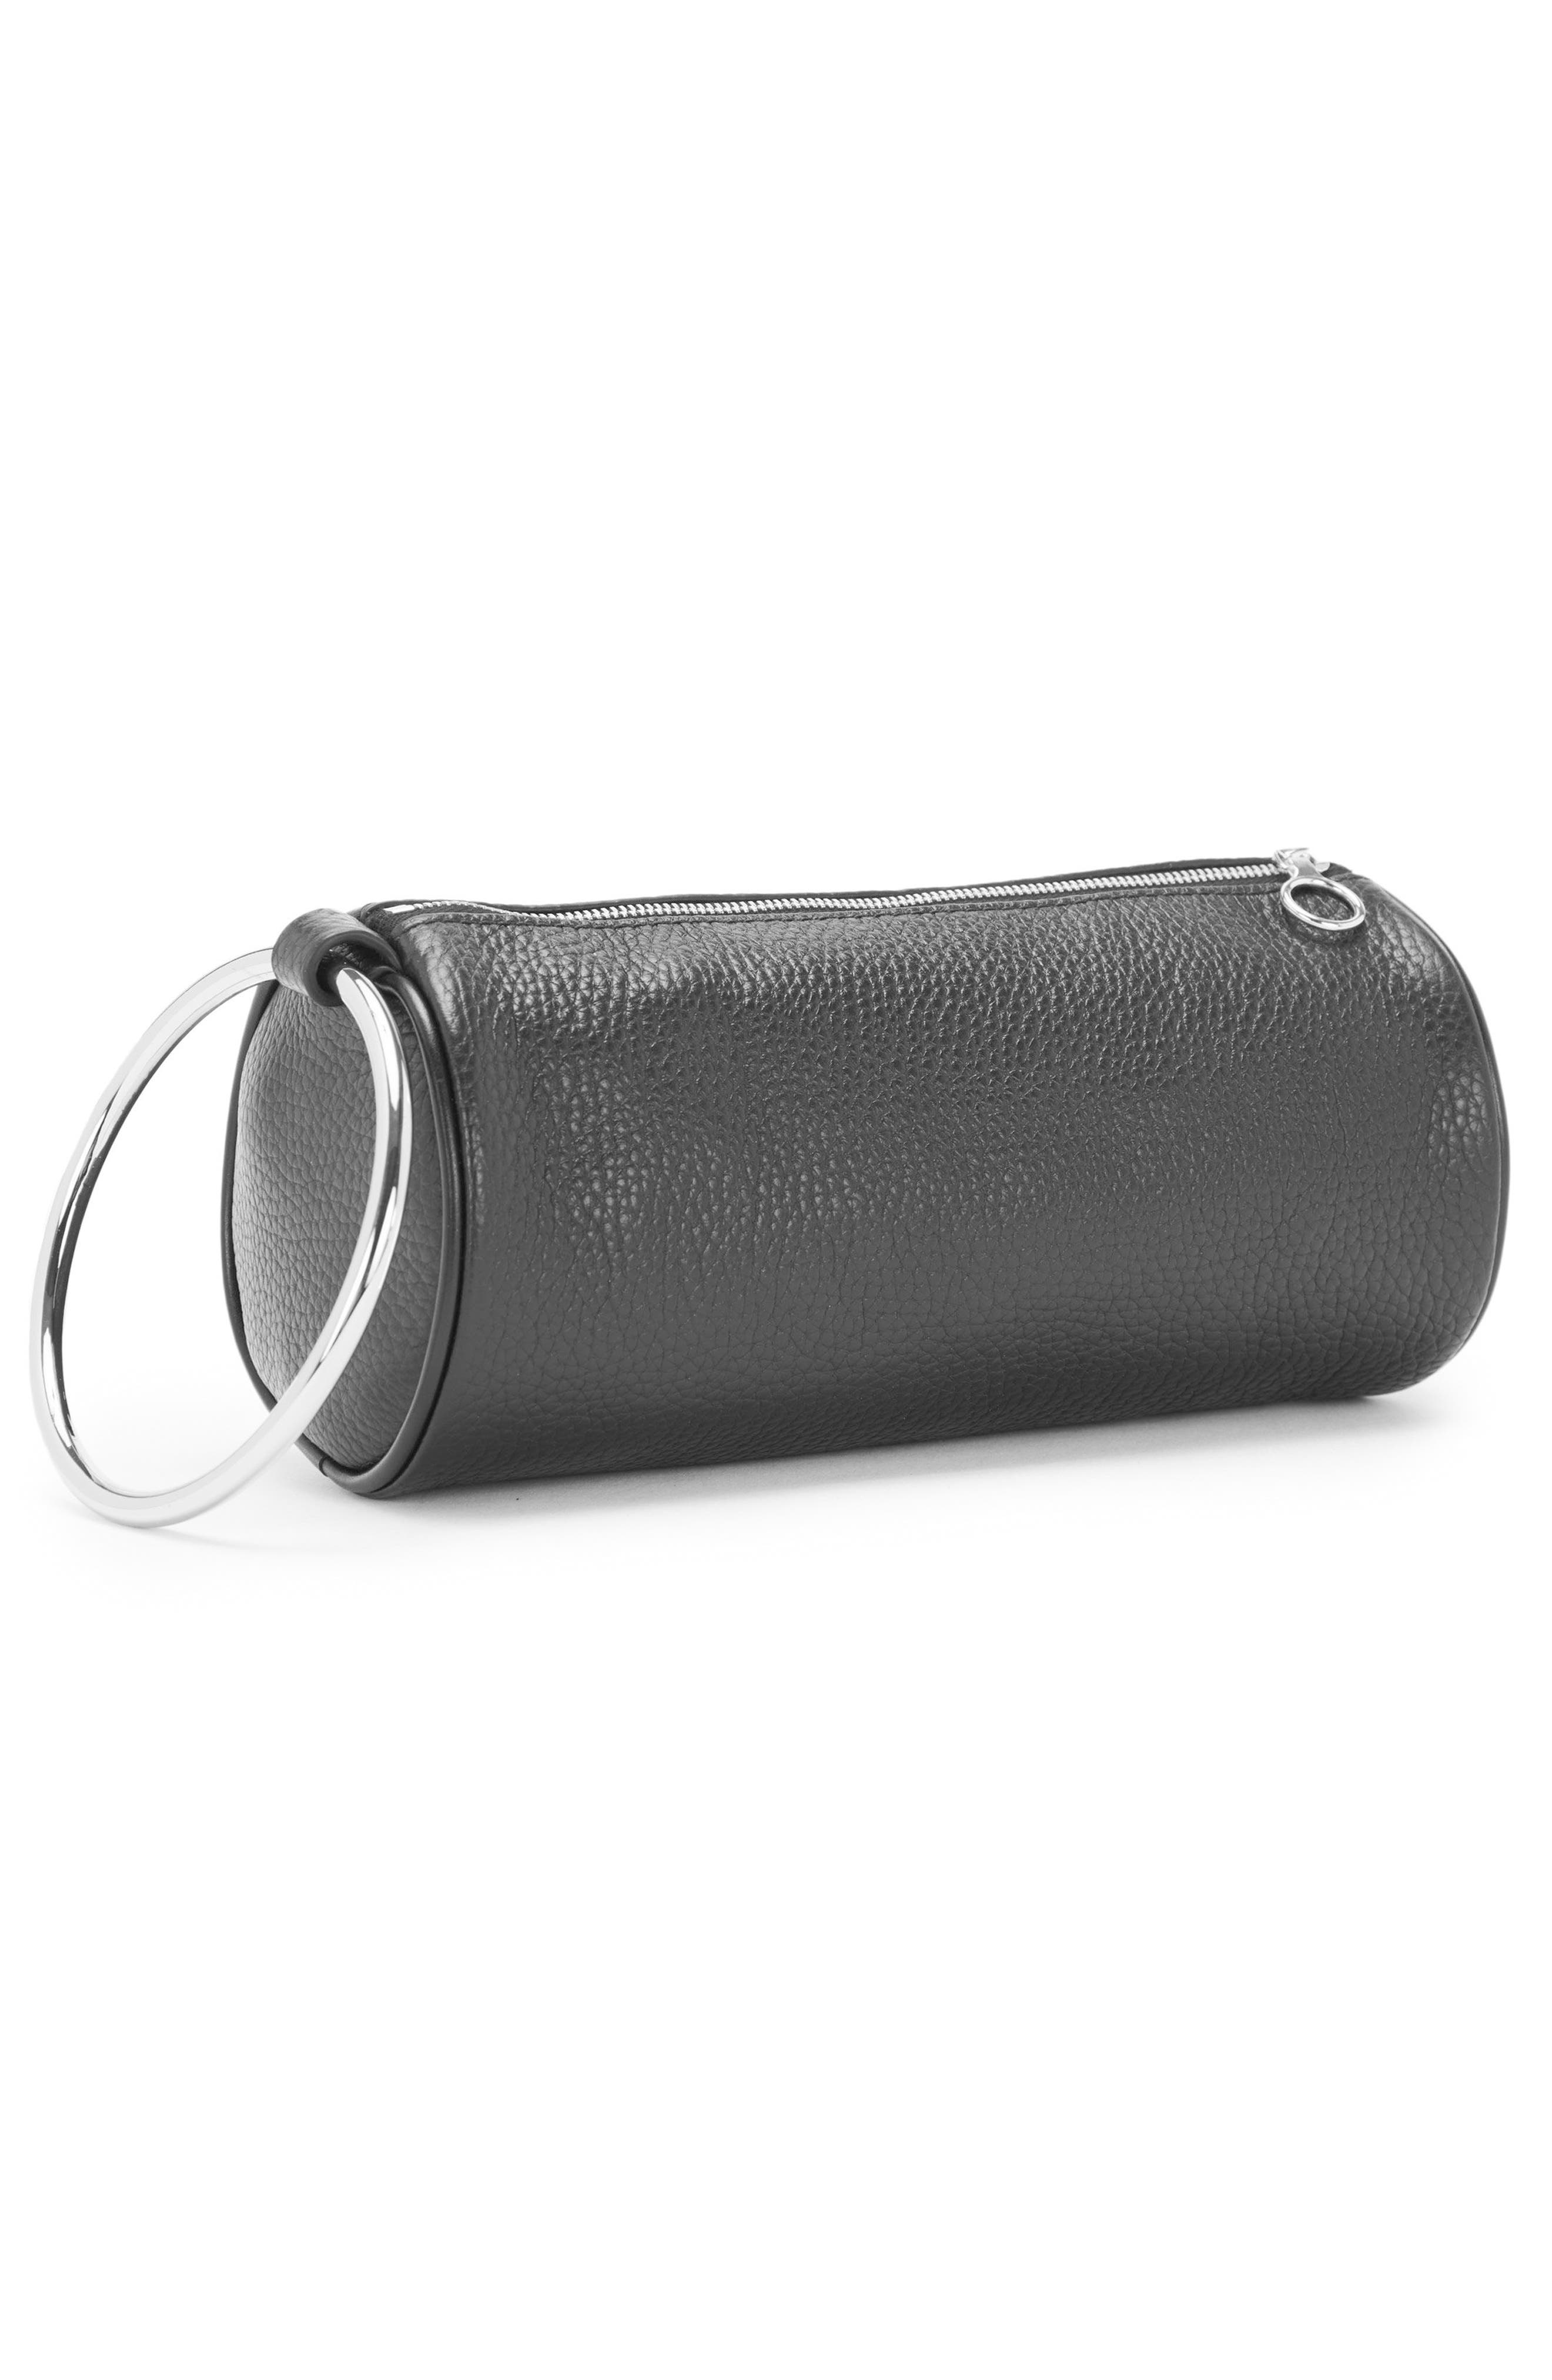 Pebbled Leather Duffel Wristlet Clutch,                             Alternate thumbnail 3, color,                             Black